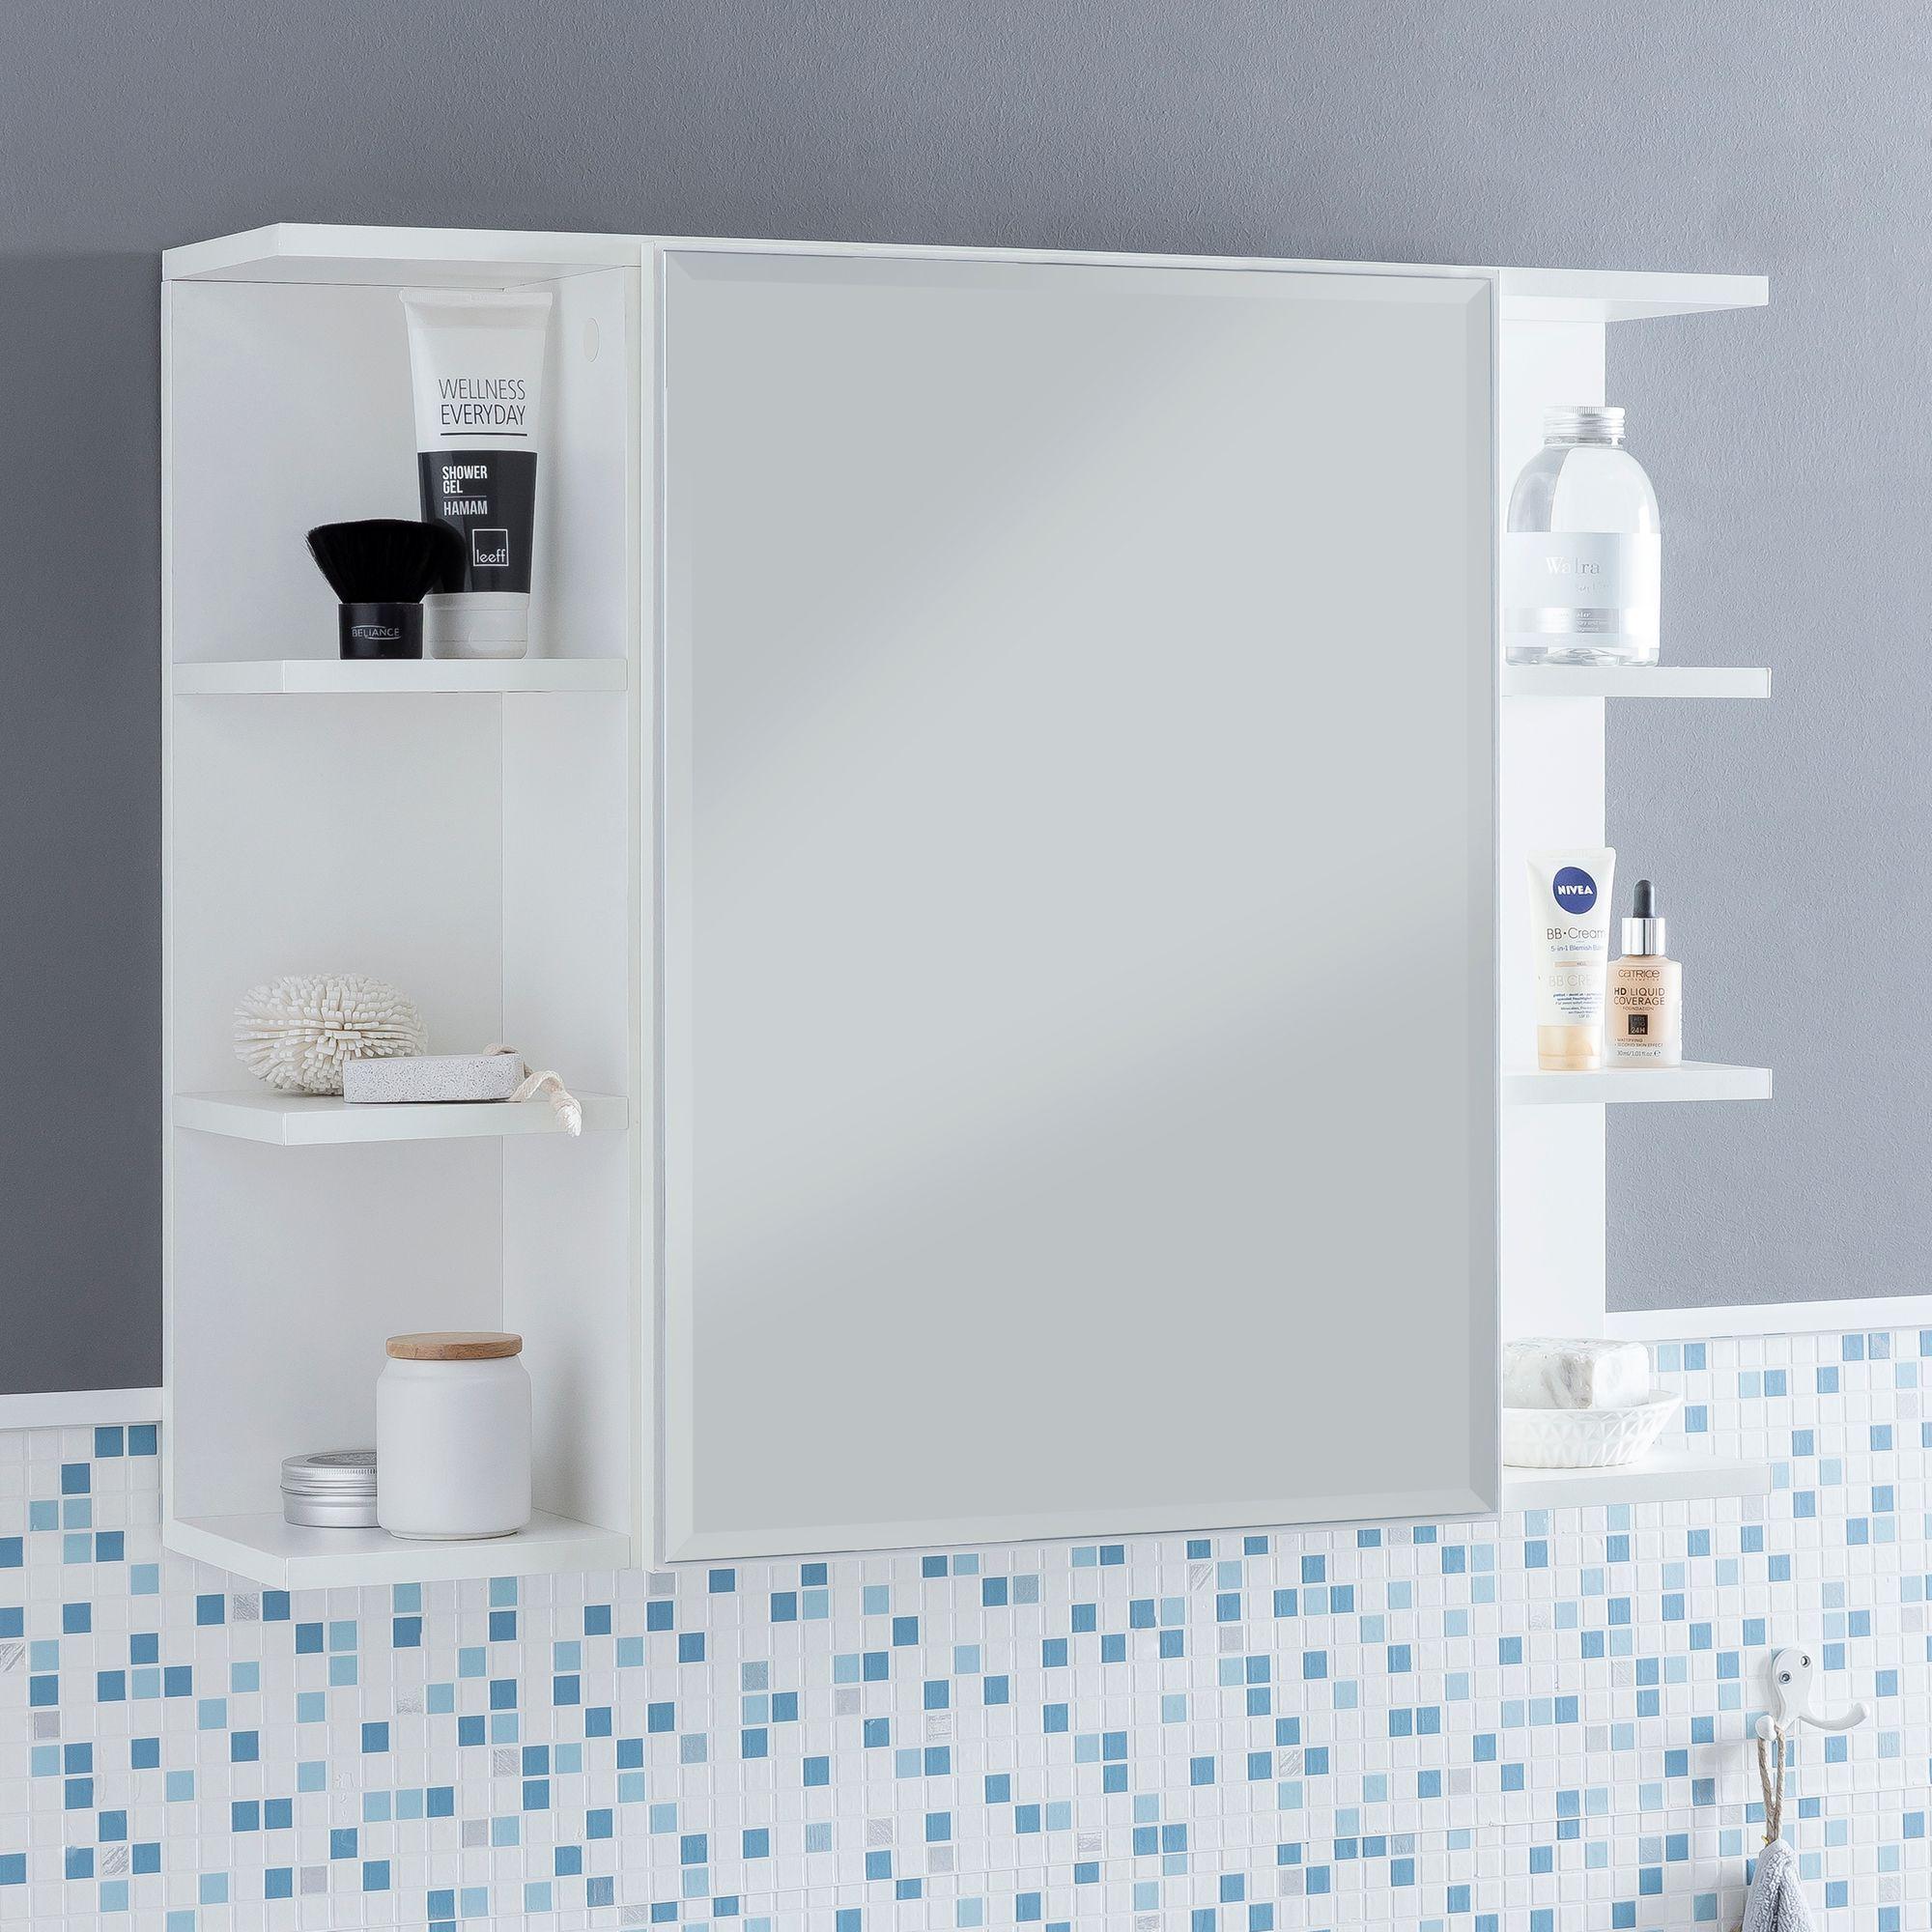 Hangeschrank Spiegelschrank Wandschrank Badezimmerschrank Regal